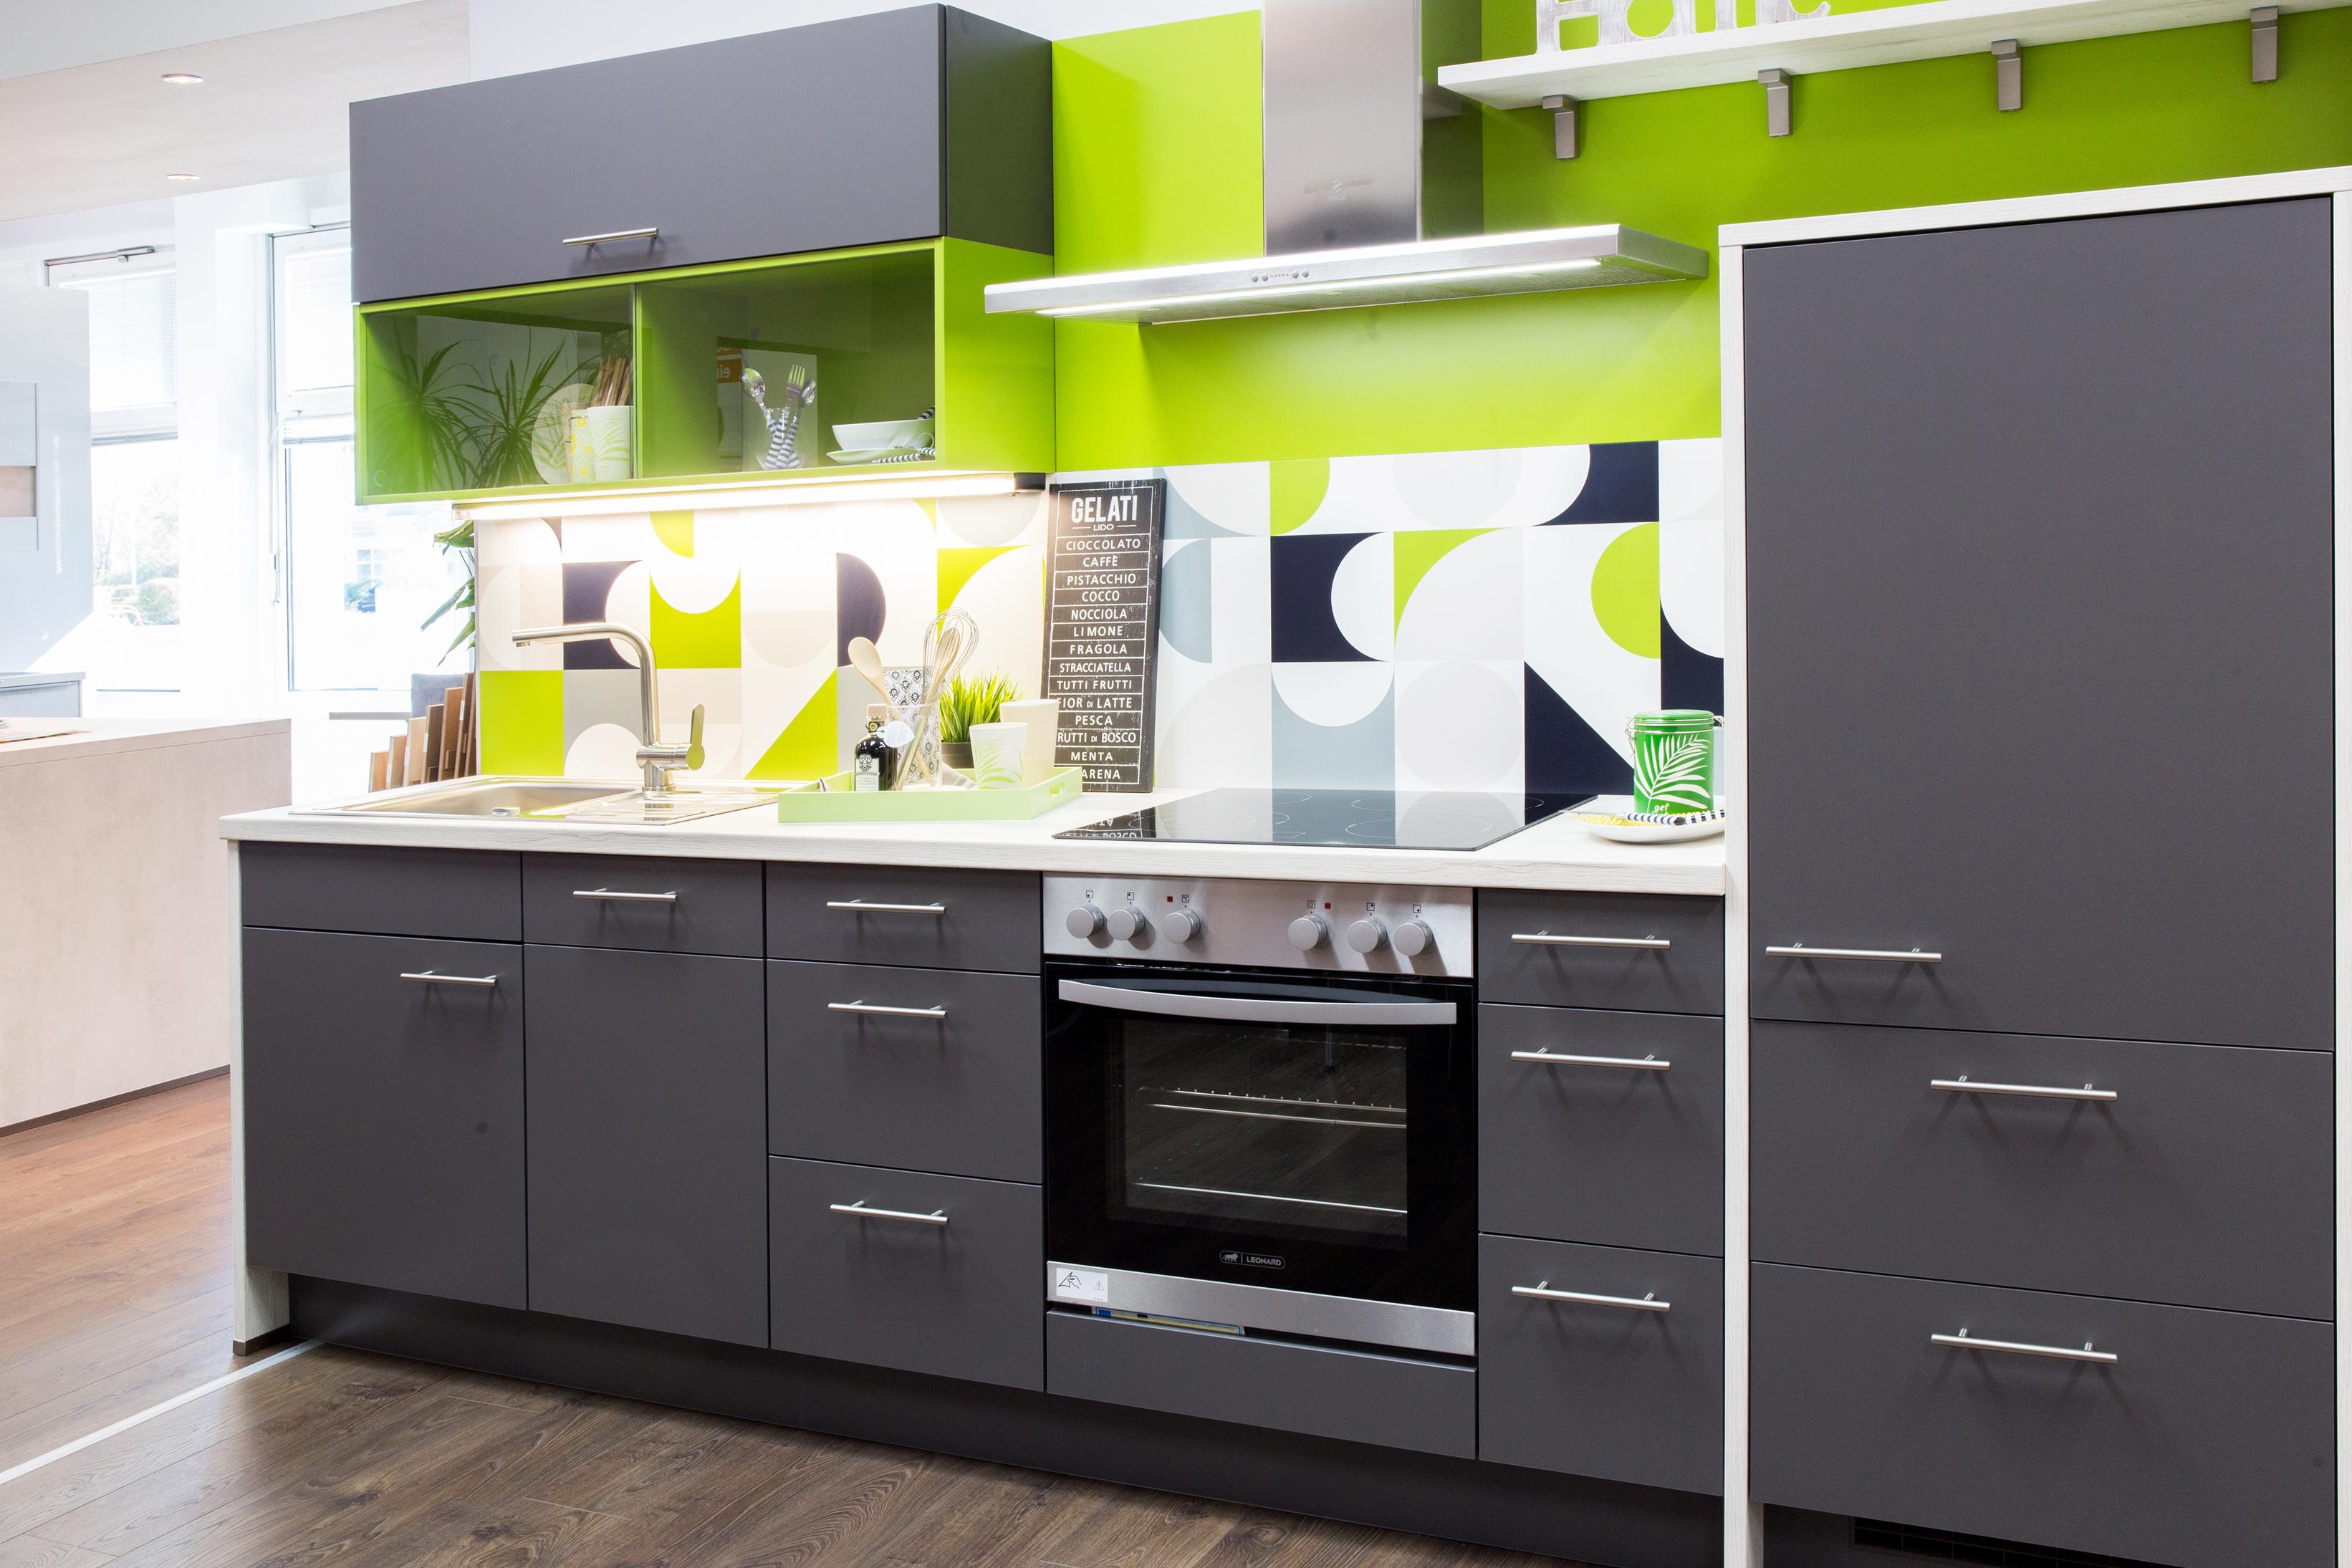 Mini Kühlschrank Tutti : Ein vw bulli kühlschrank zu hause deko locker storage cabinet